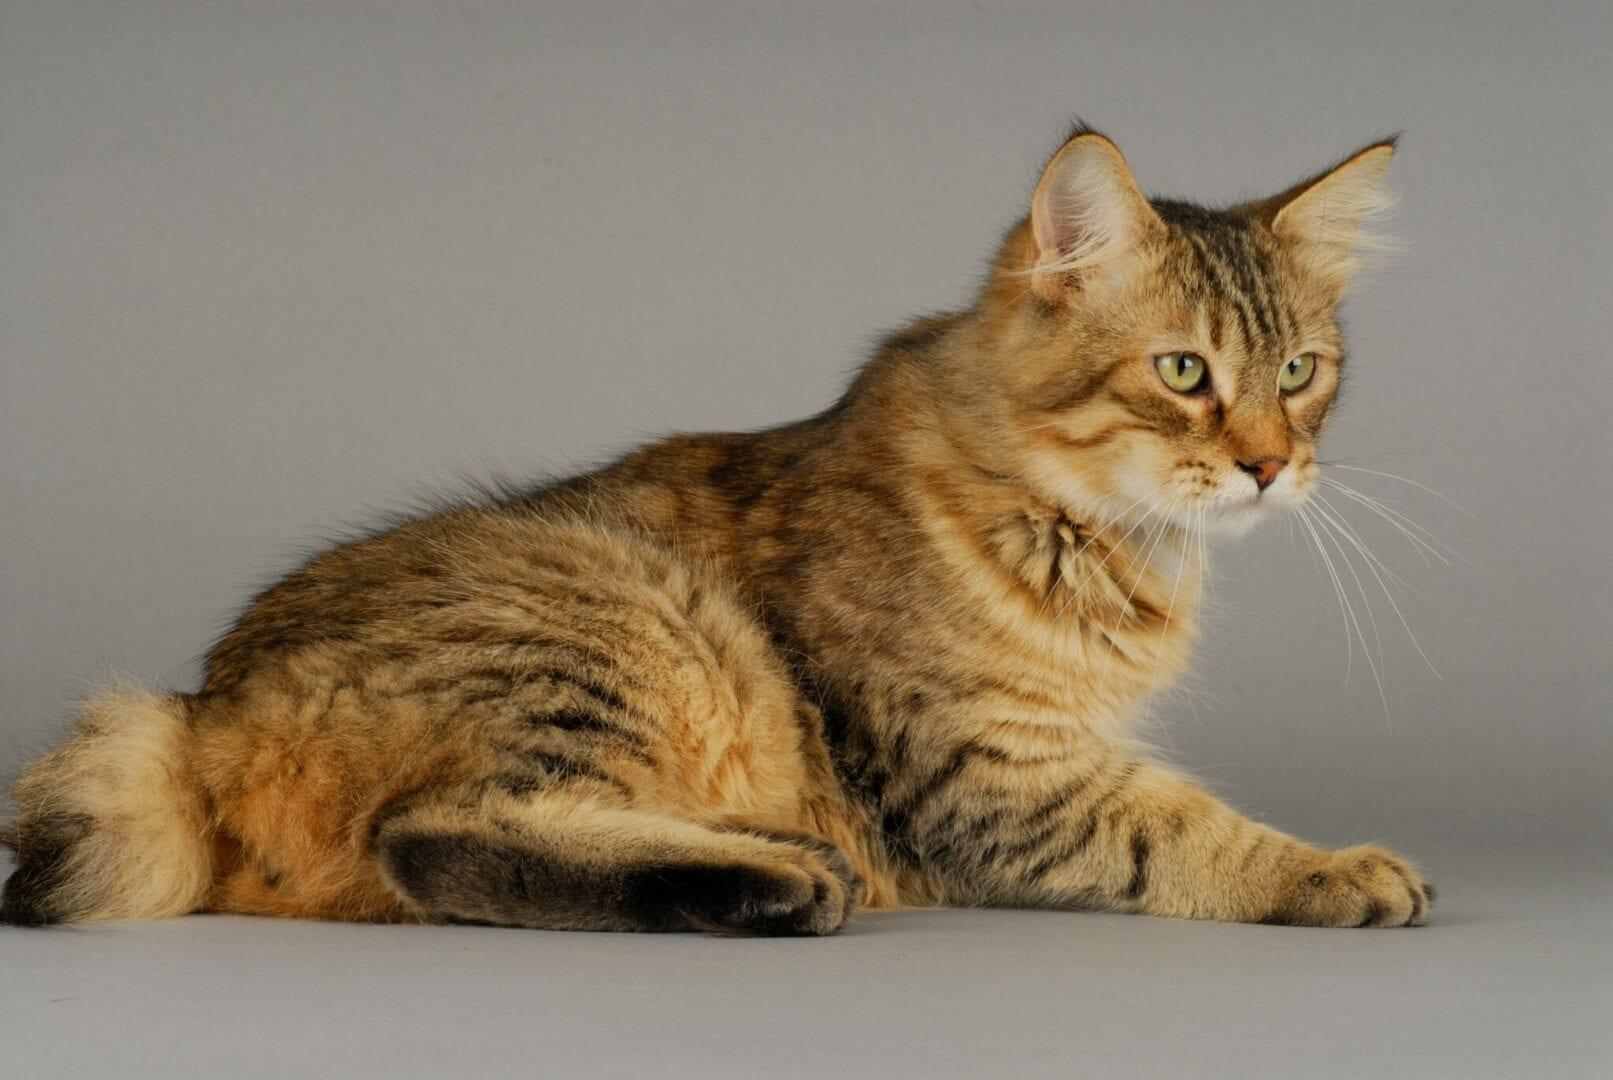 Pixie Bob cat breed facts